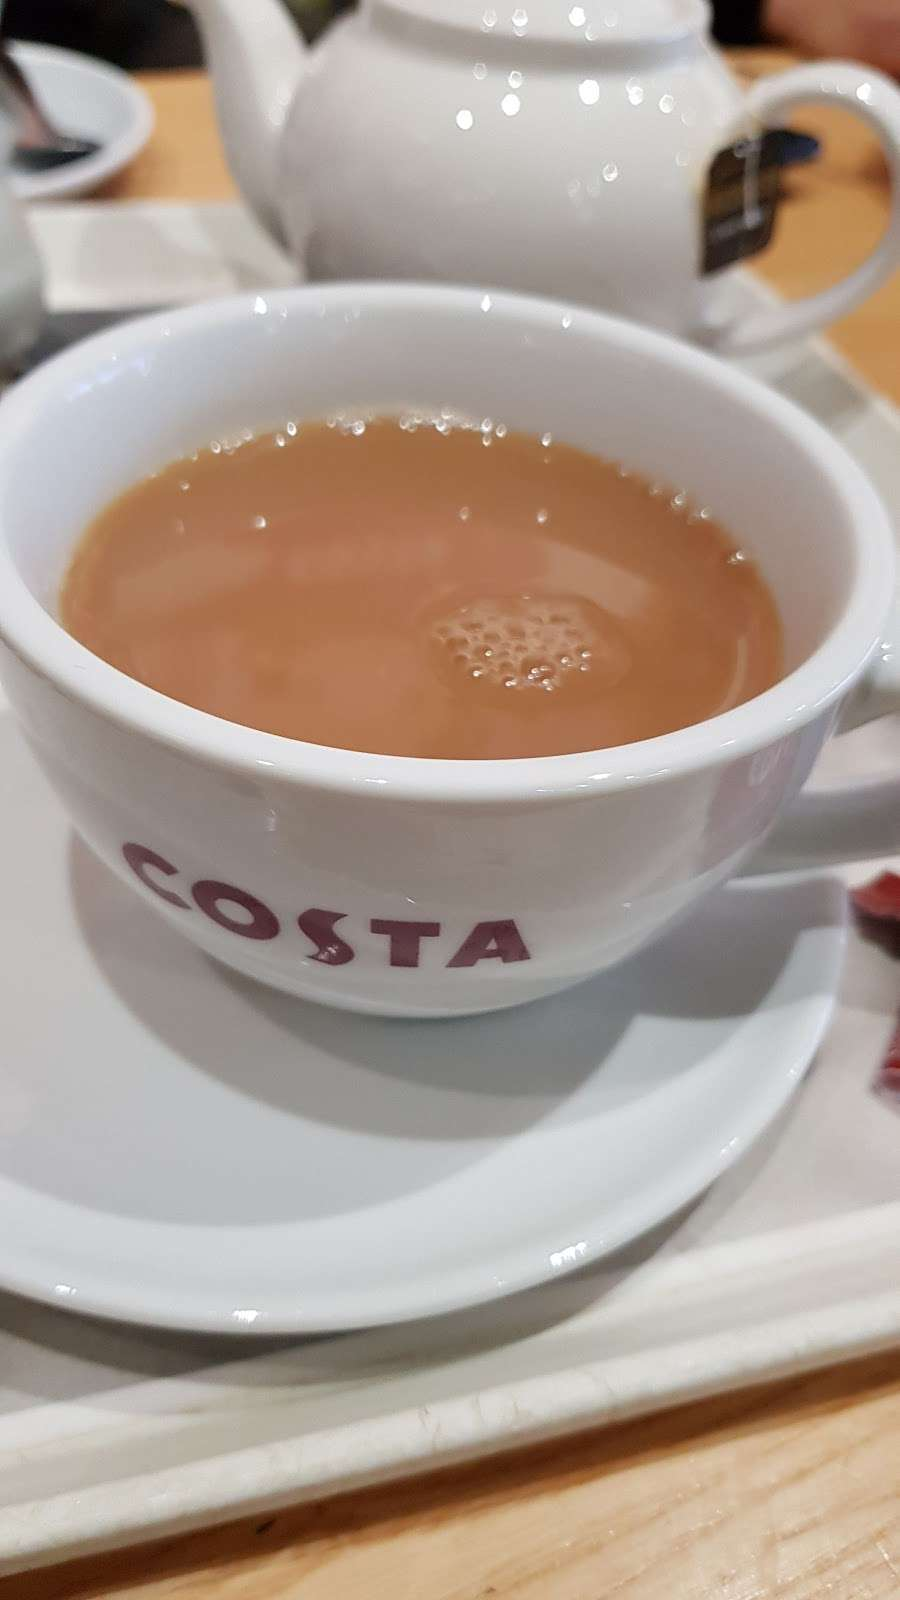 Costa Coffee - cafe    Photo 10 of 10   Address: 8 Warwick Parade, Kenton Ln, Harrow HA3 8SA, UK   Phone: 020 8907 7759